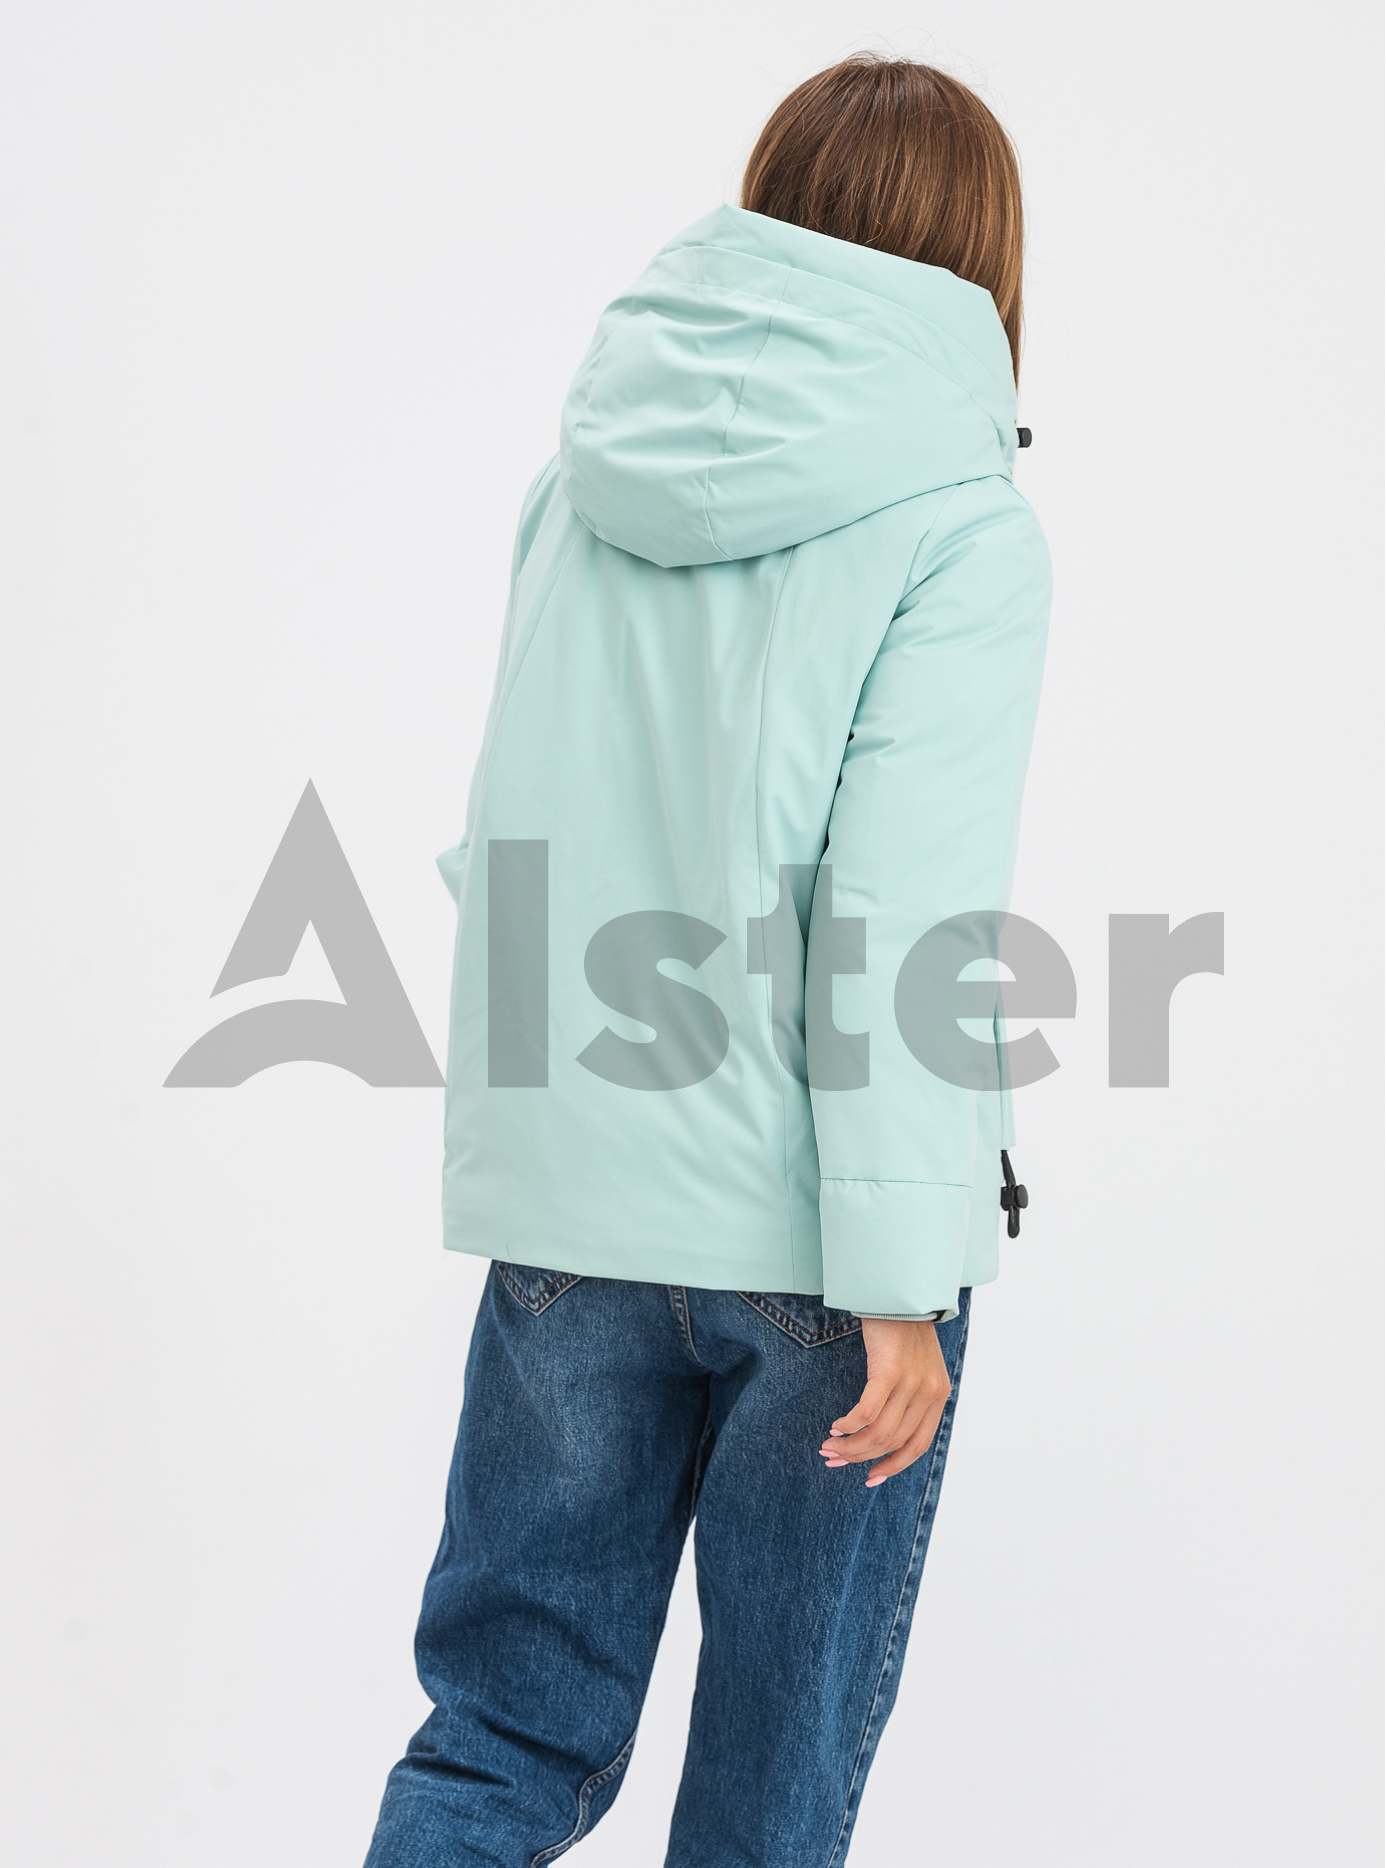 Жіноча зимова куртка TOWMY М'ята L (TWM3370-13): фото - Alster.ua